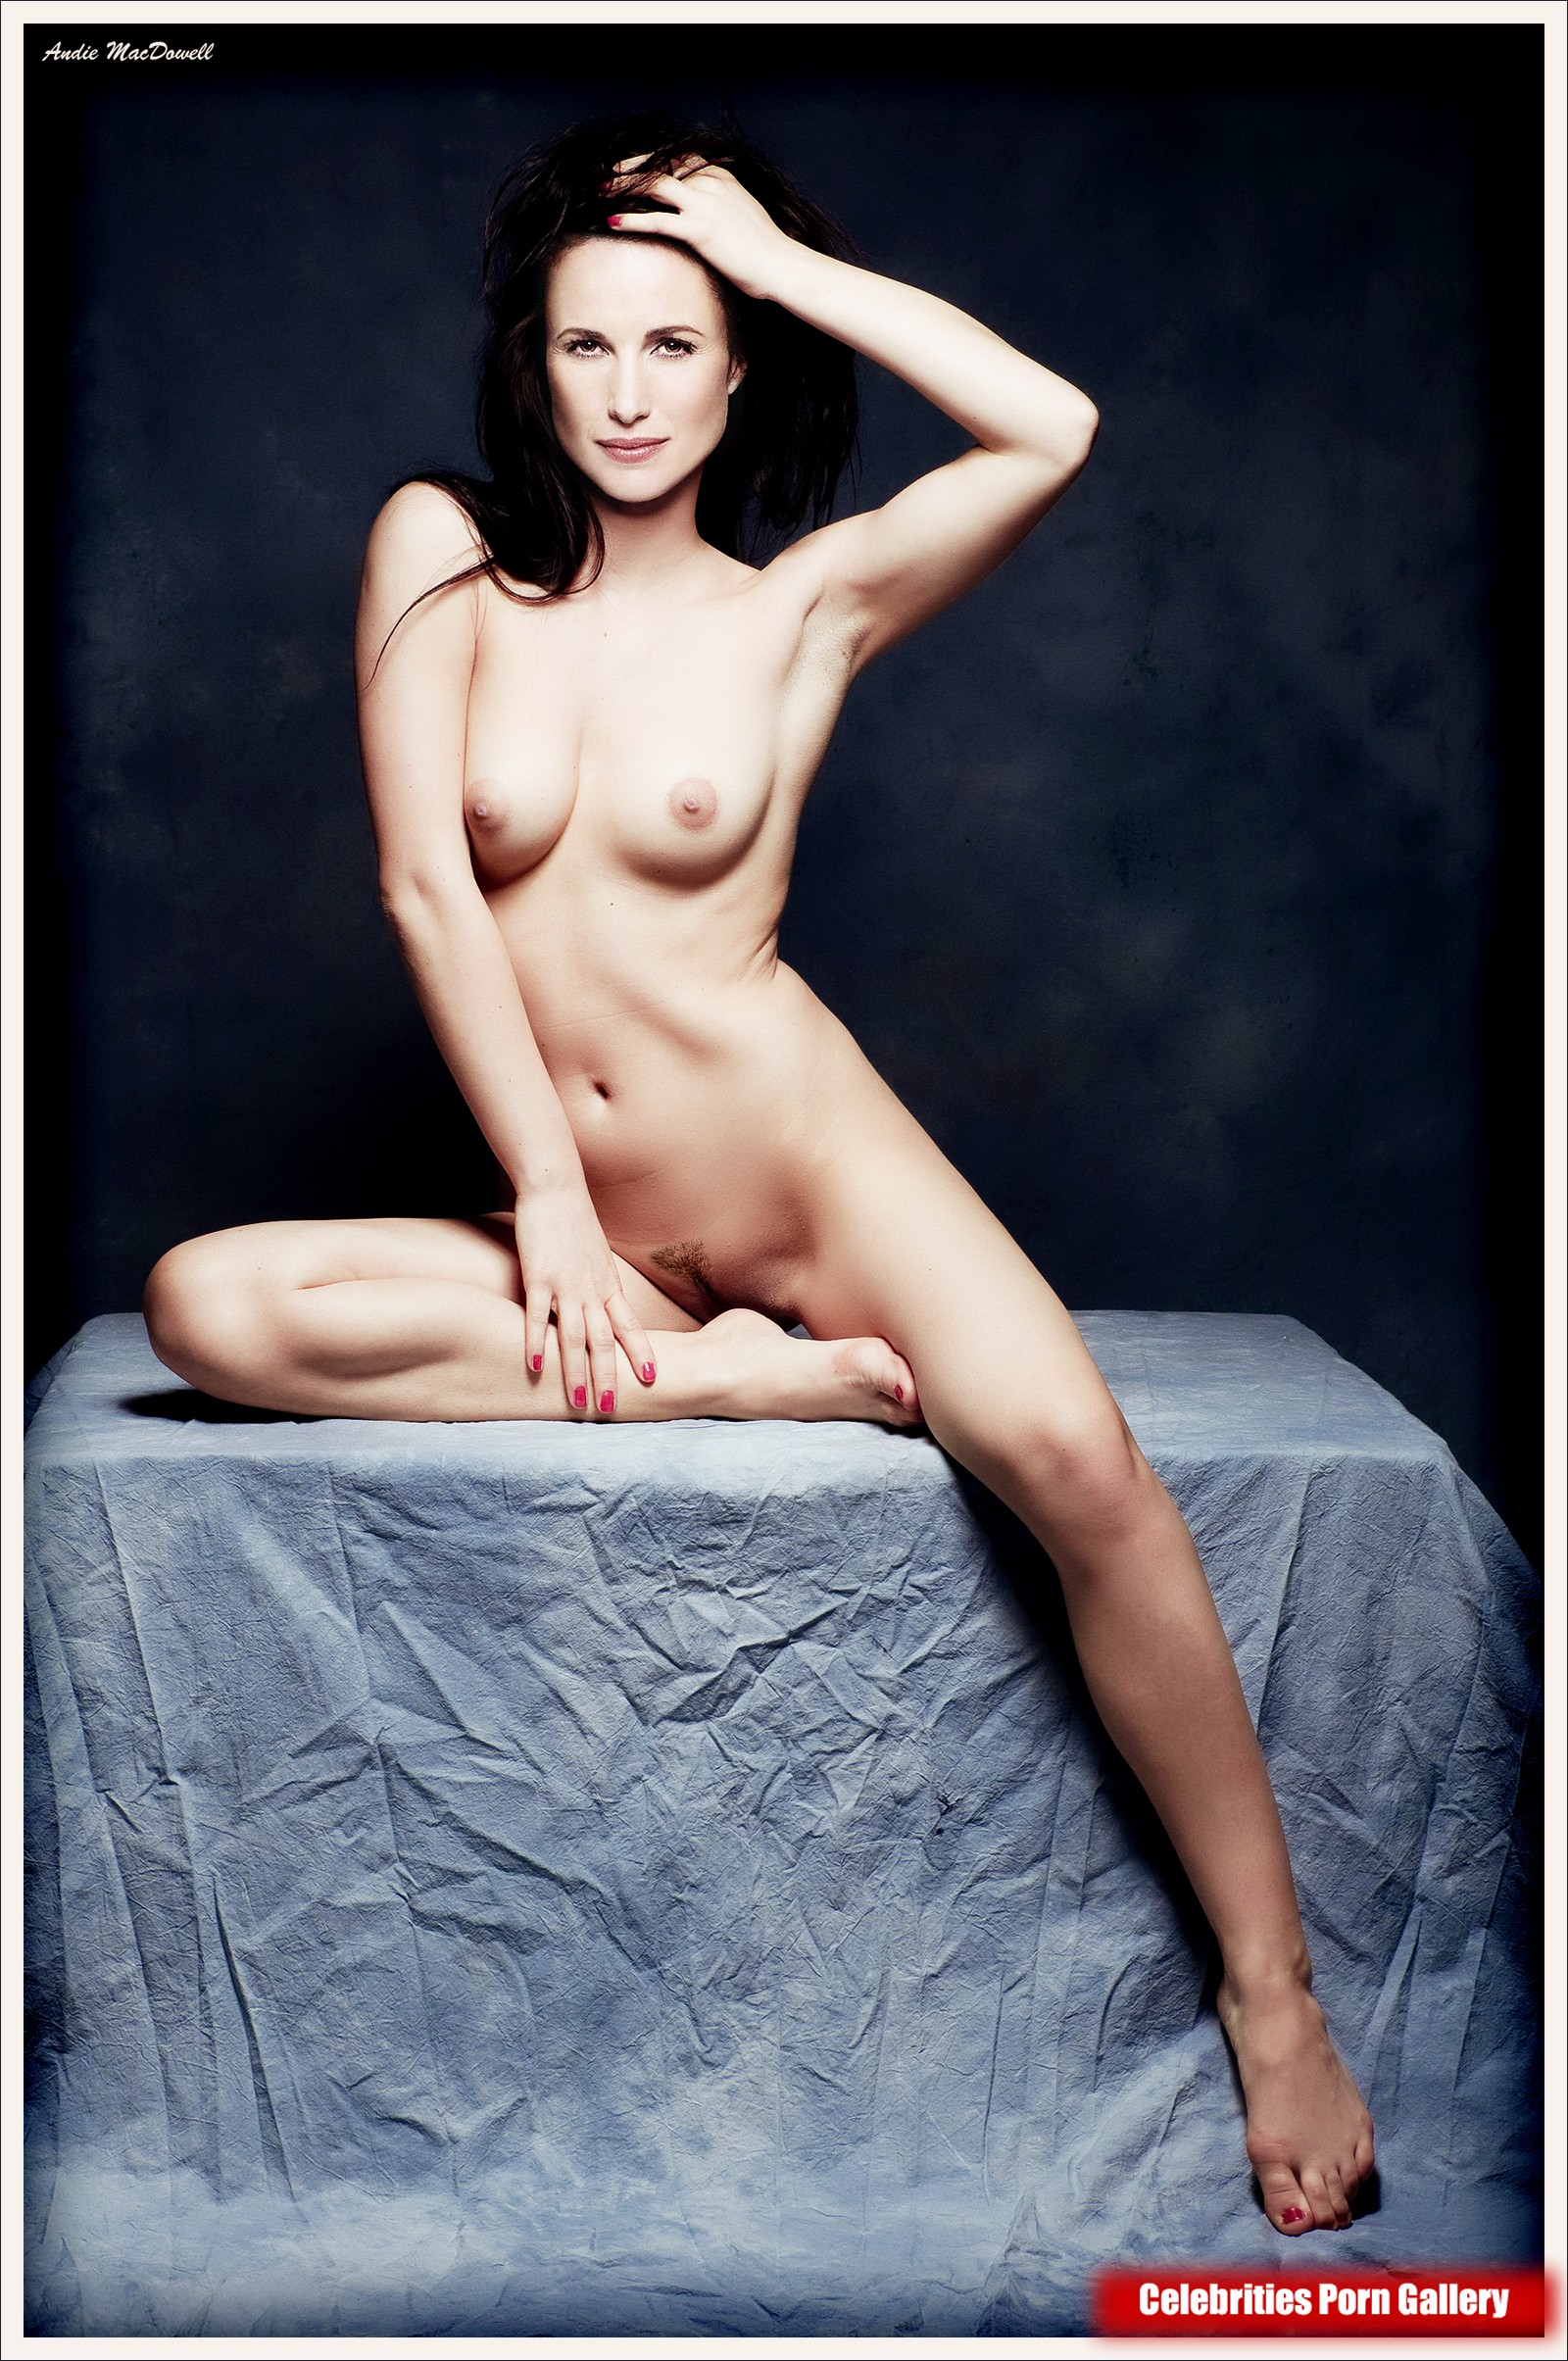 Older actress nudes free